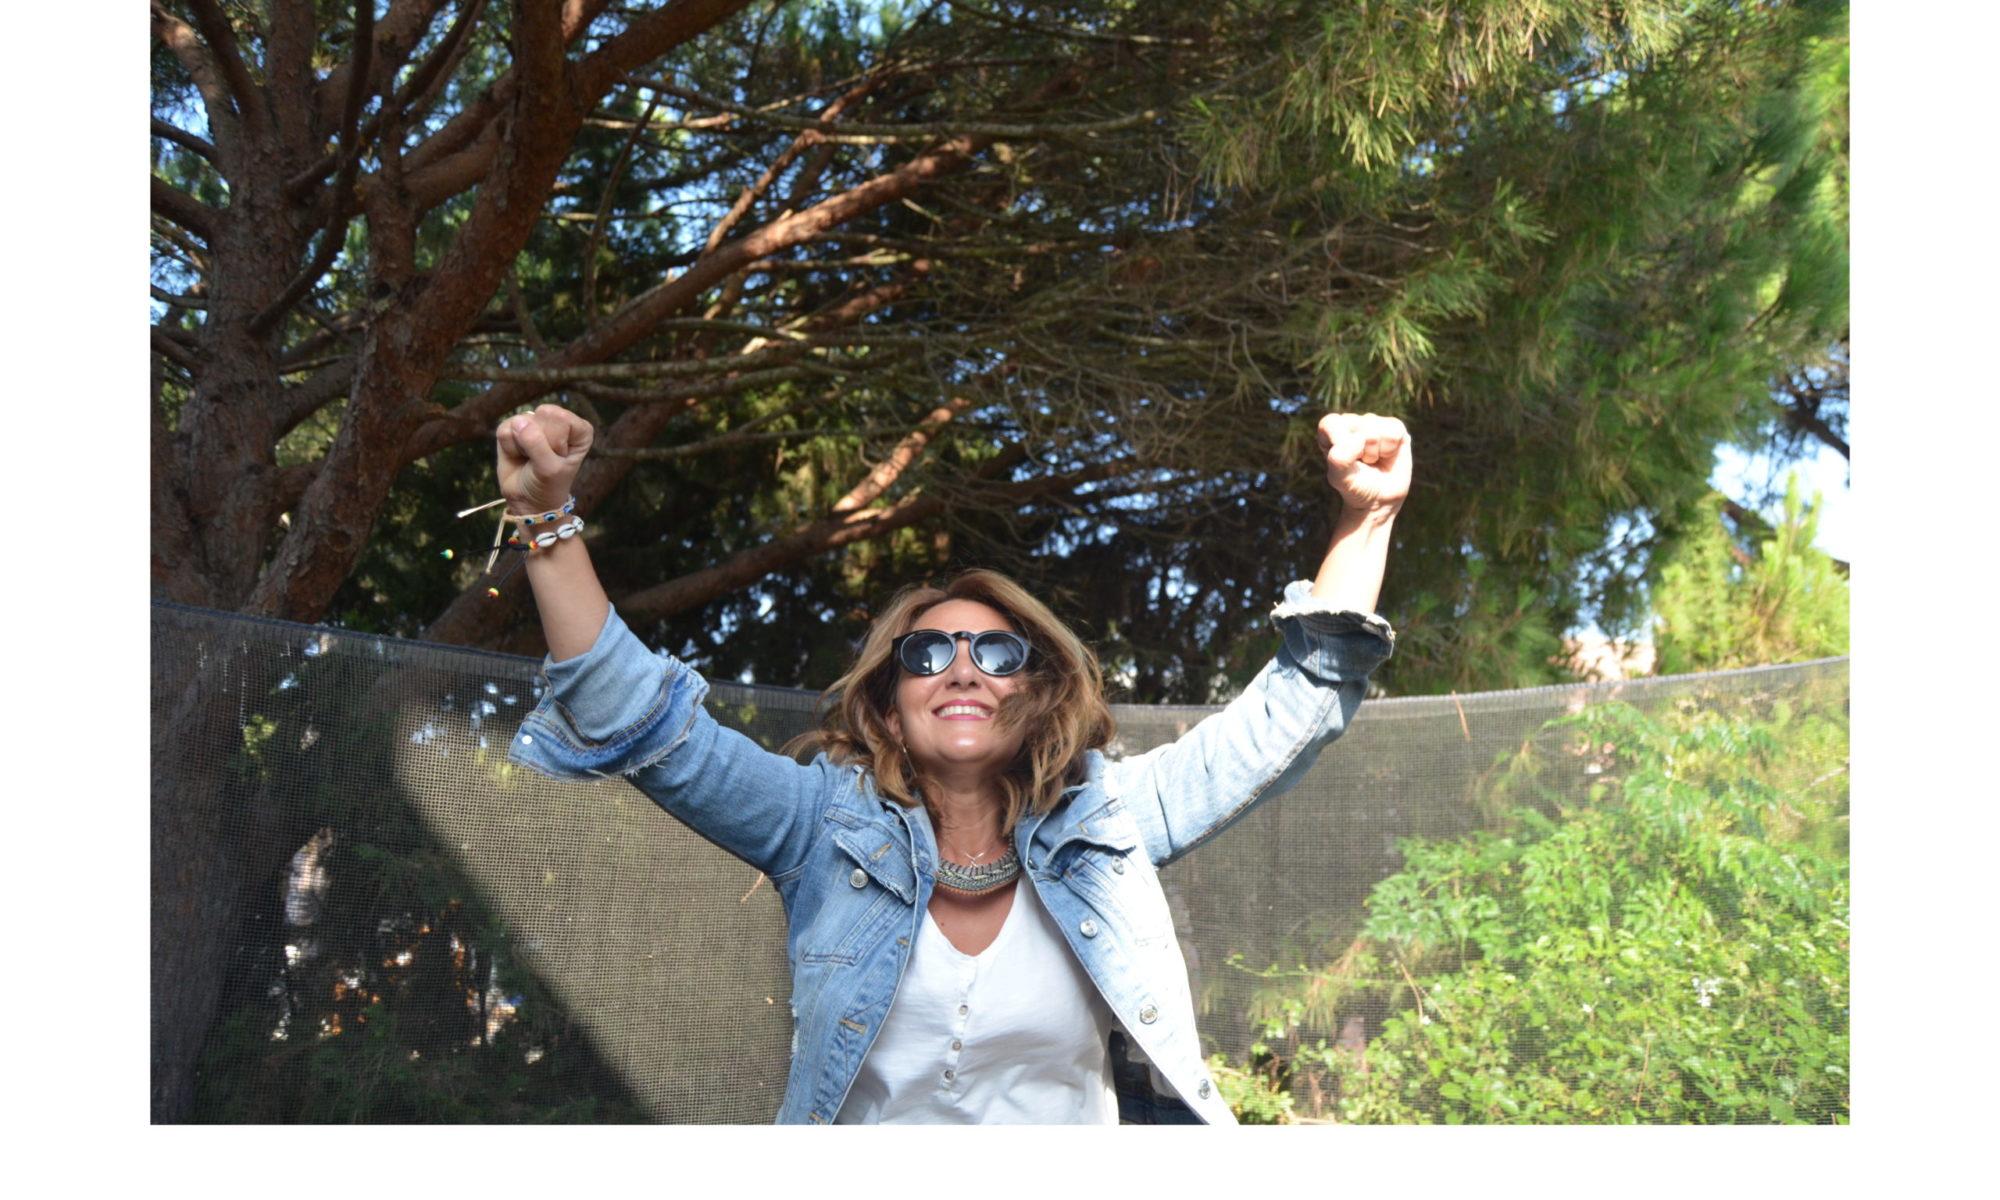 Cristina #TuImpulso